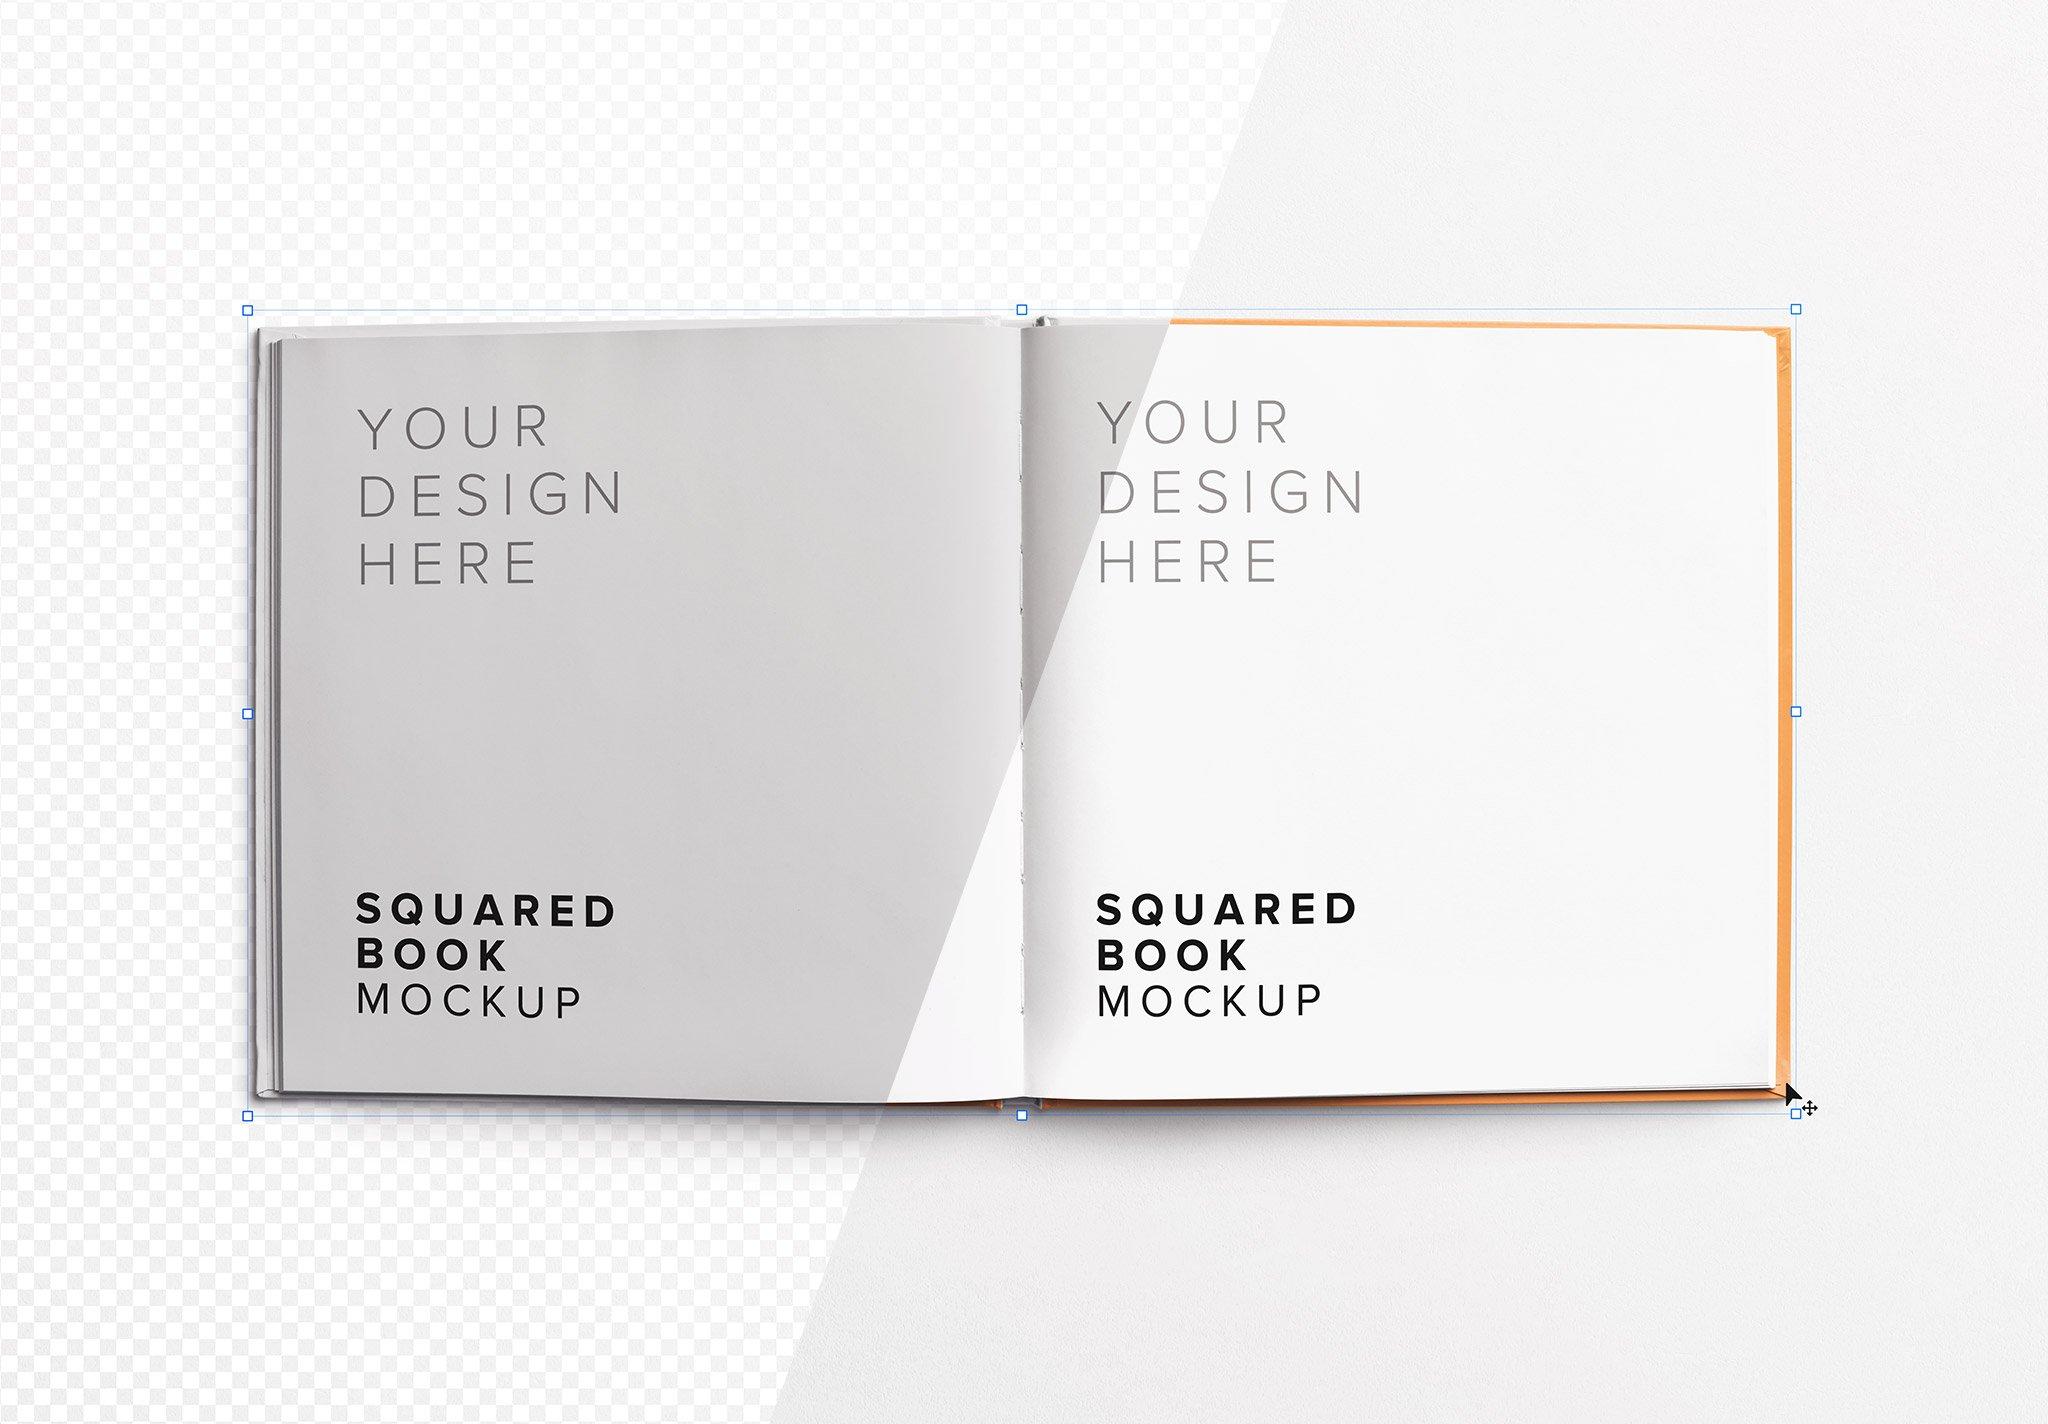 book squared opened mockup image01